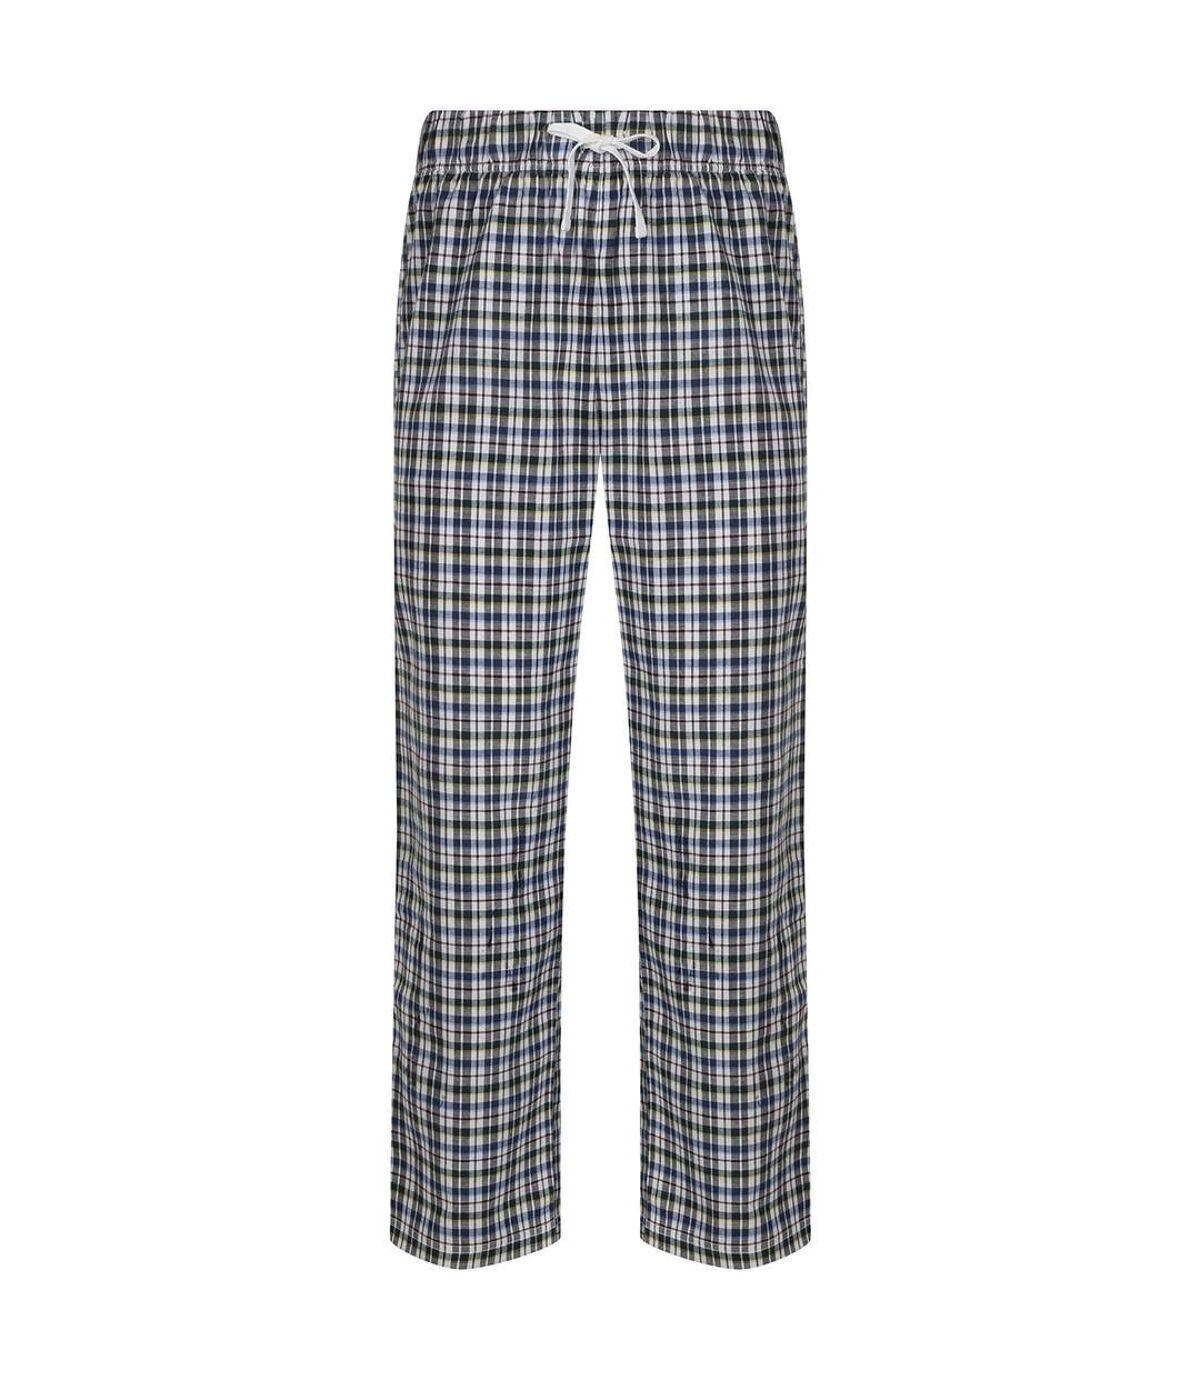 Skinnifit Mens Tartan Lounge Pants (White/Multi Check) - UTRW6023